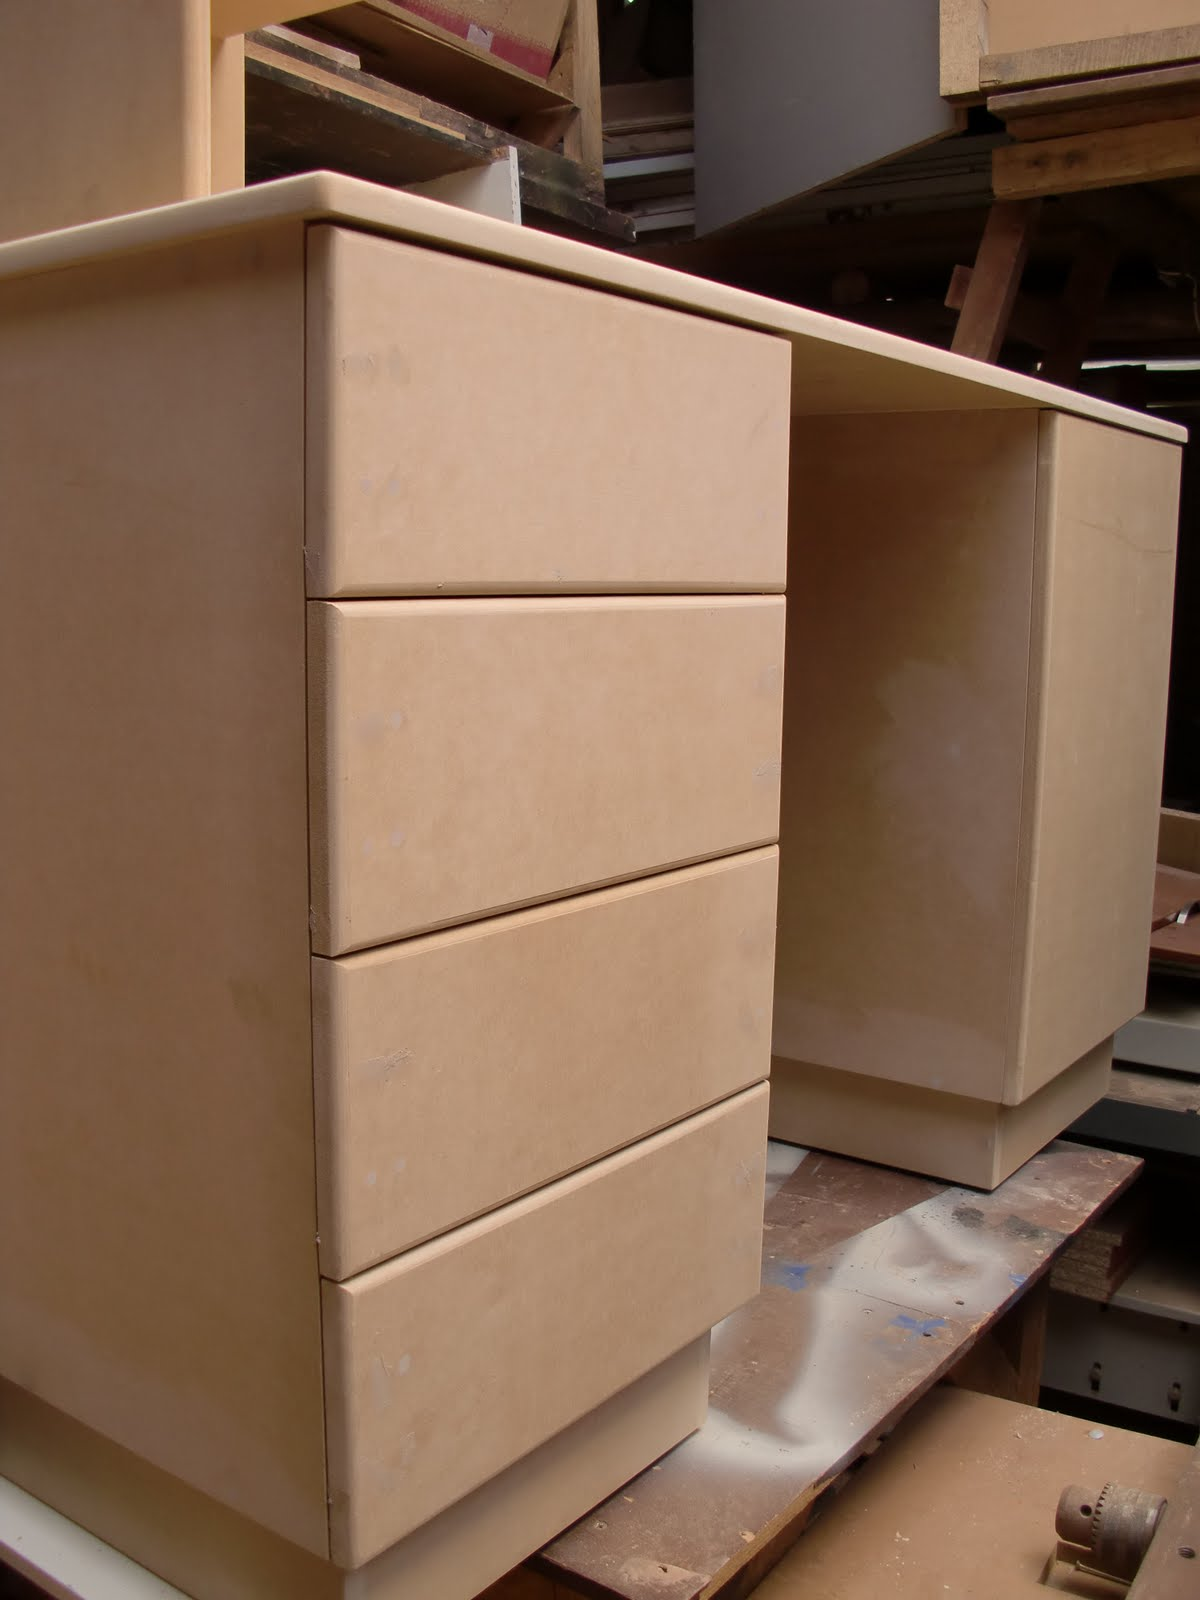 en este caso pintare un mueble, por ello usare este tipo de